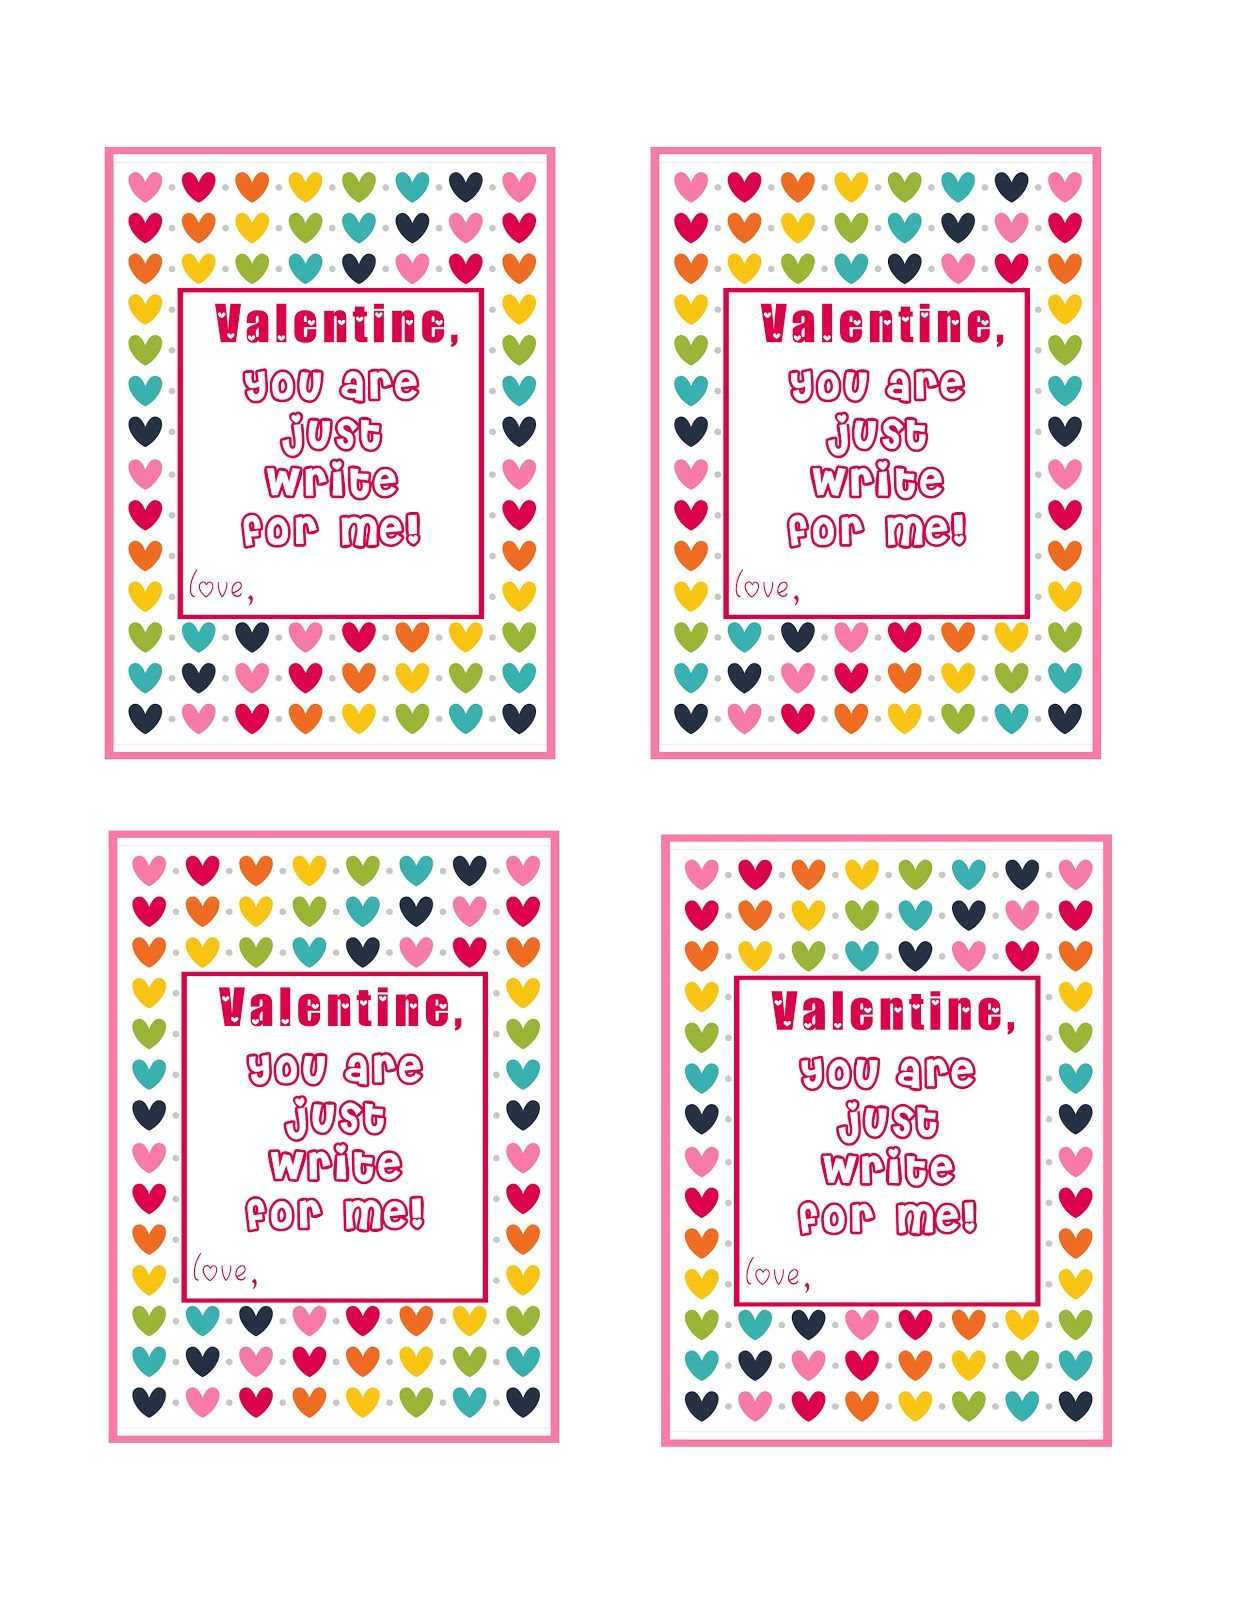 Great Last Minute Valentine Card Ideas! Free Printables ...